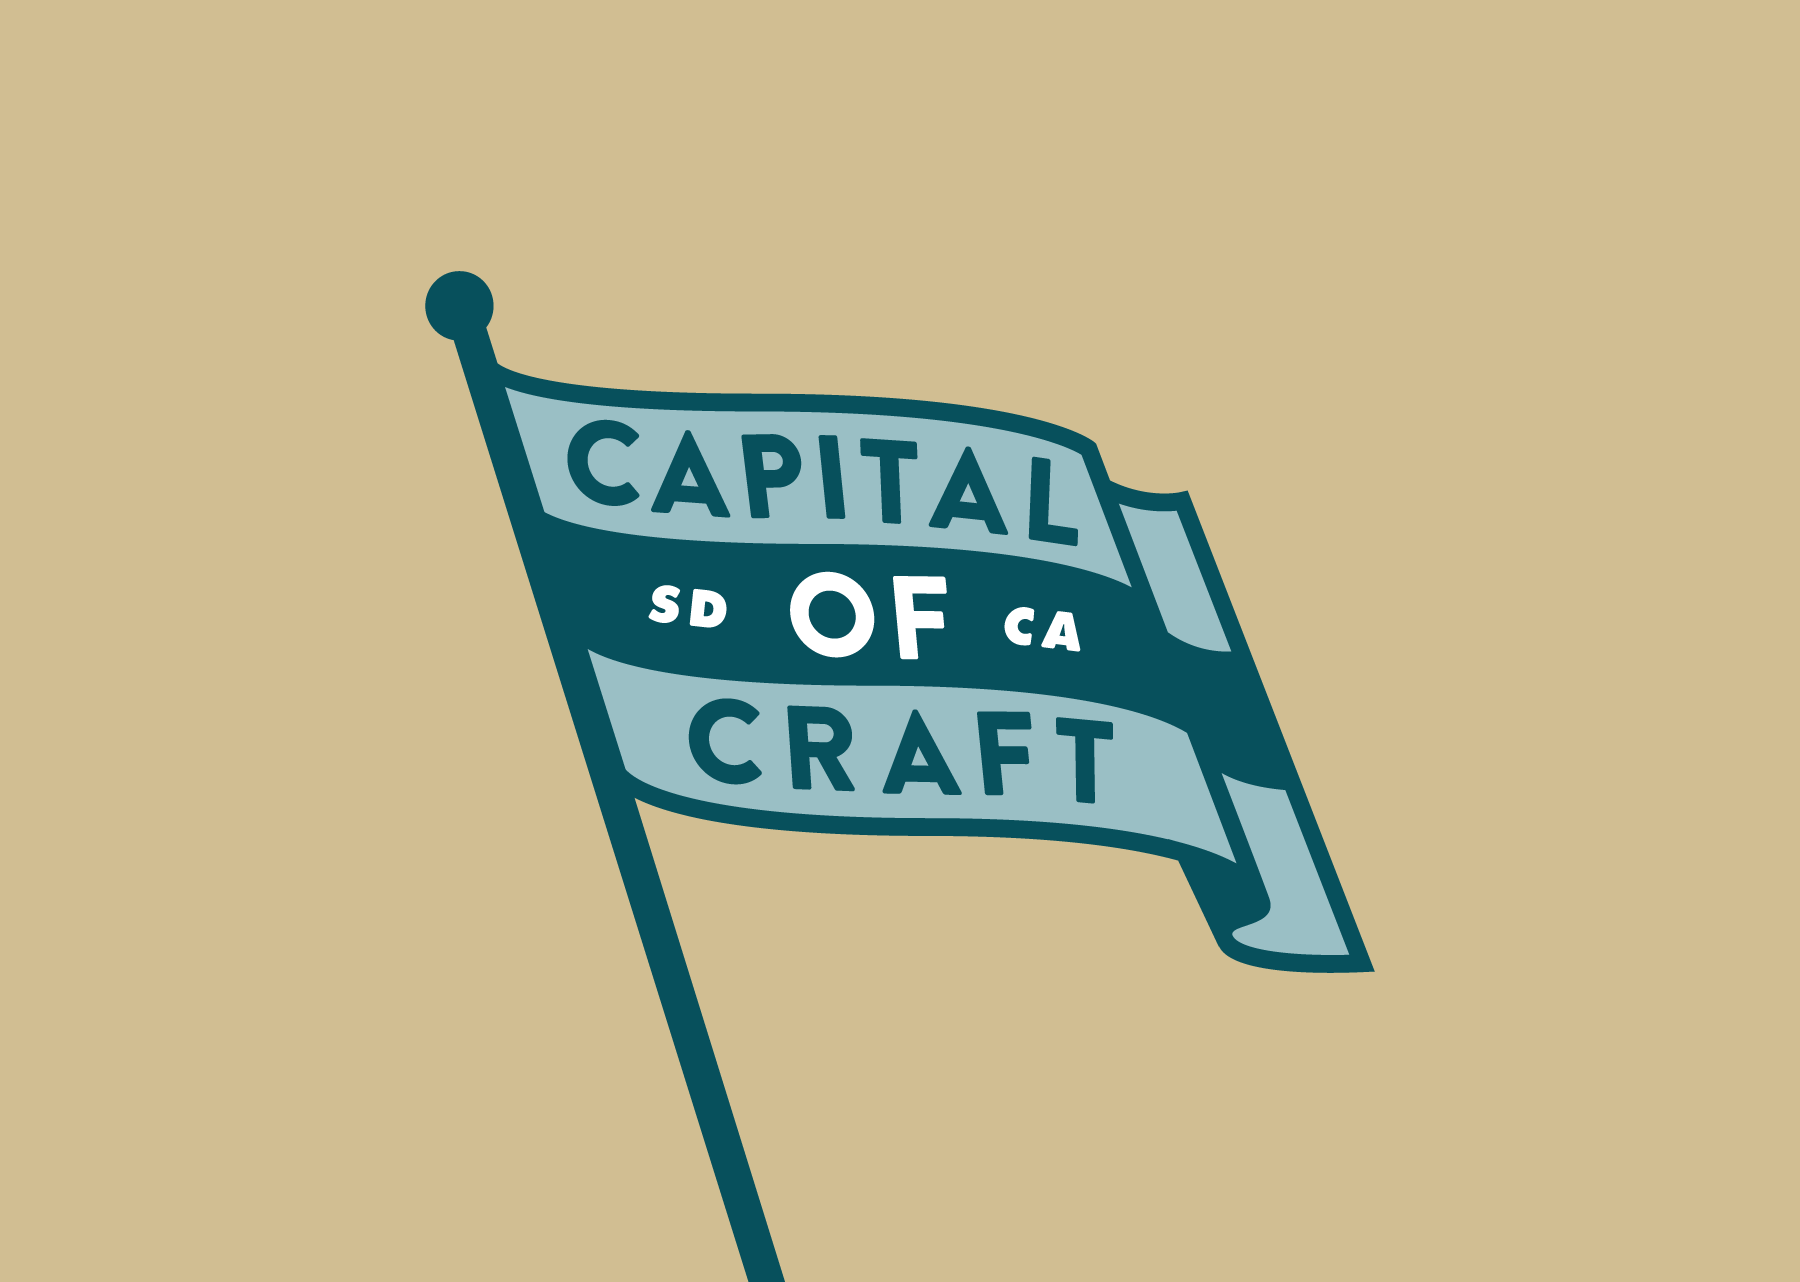 CAPITAL OF CRAFT